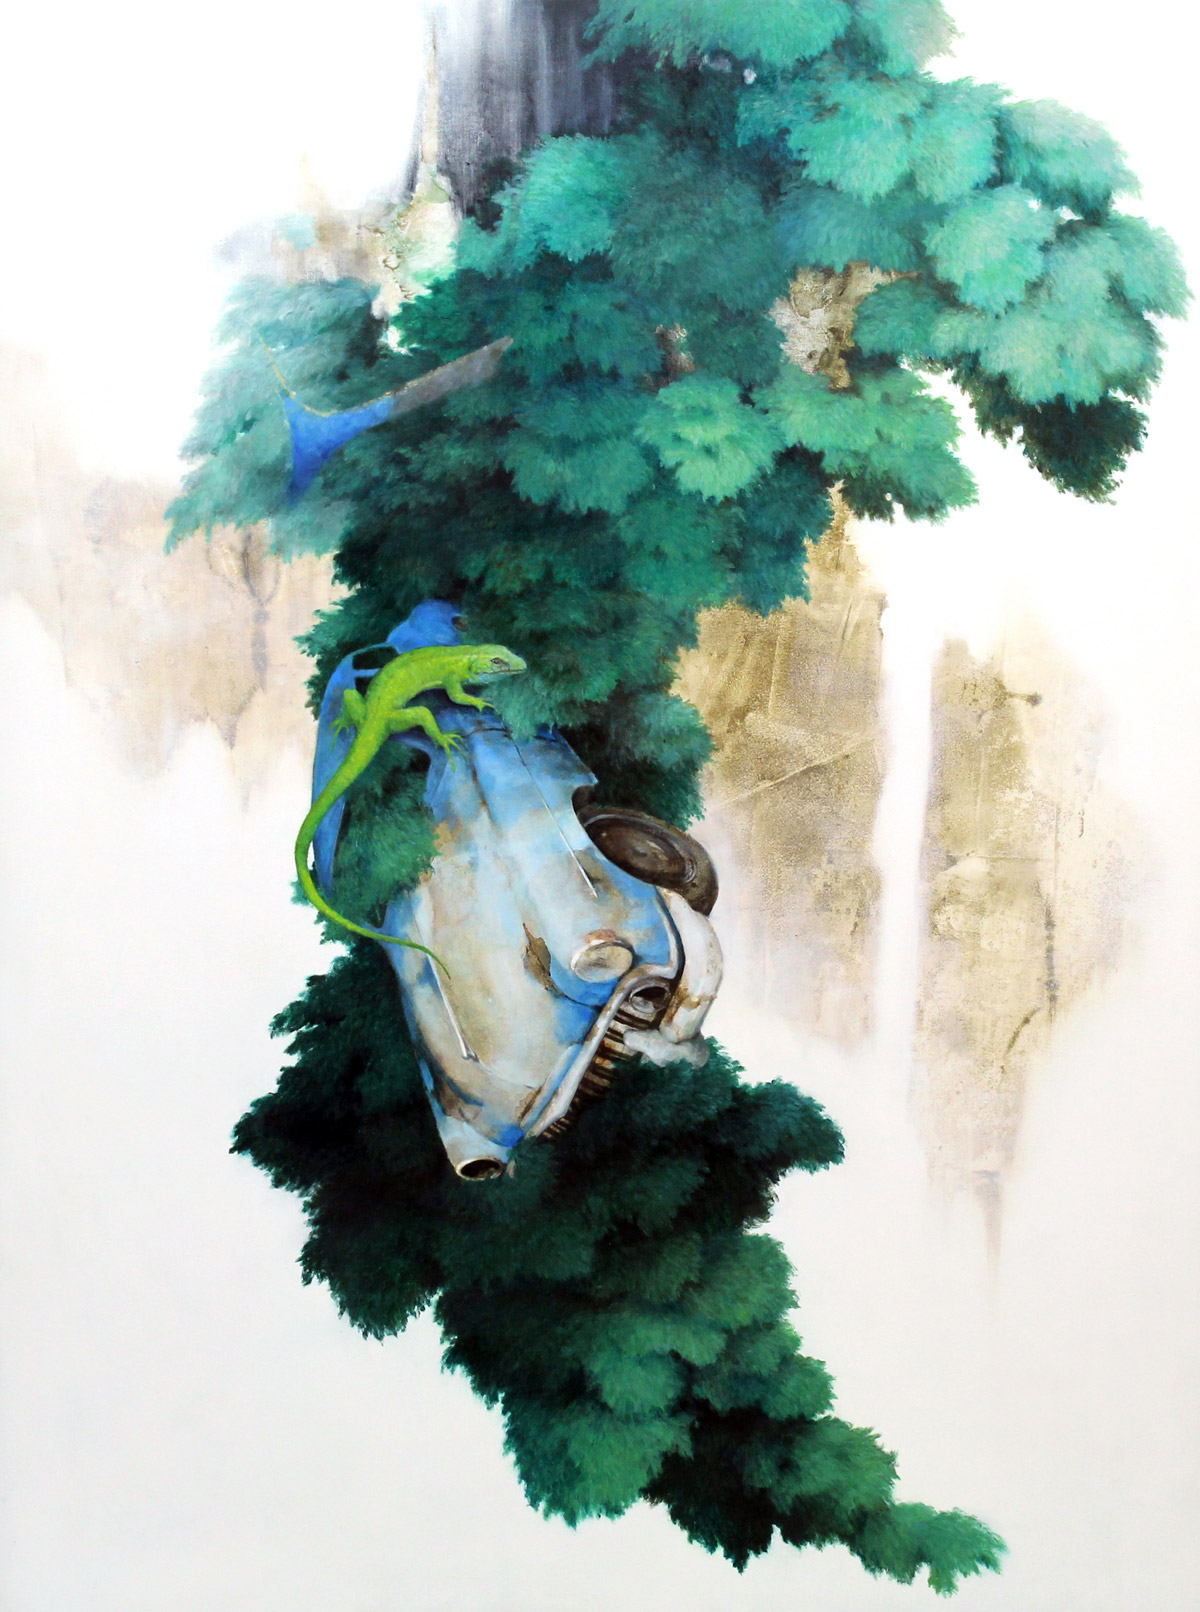 Artist Spotlight: Carlo Cane – BOOOOOOOM! – CREATE * INSPIRE * COMMUNITY * ART * DESIGN * MUSIC * FILM * PHOTO * PROJECTS